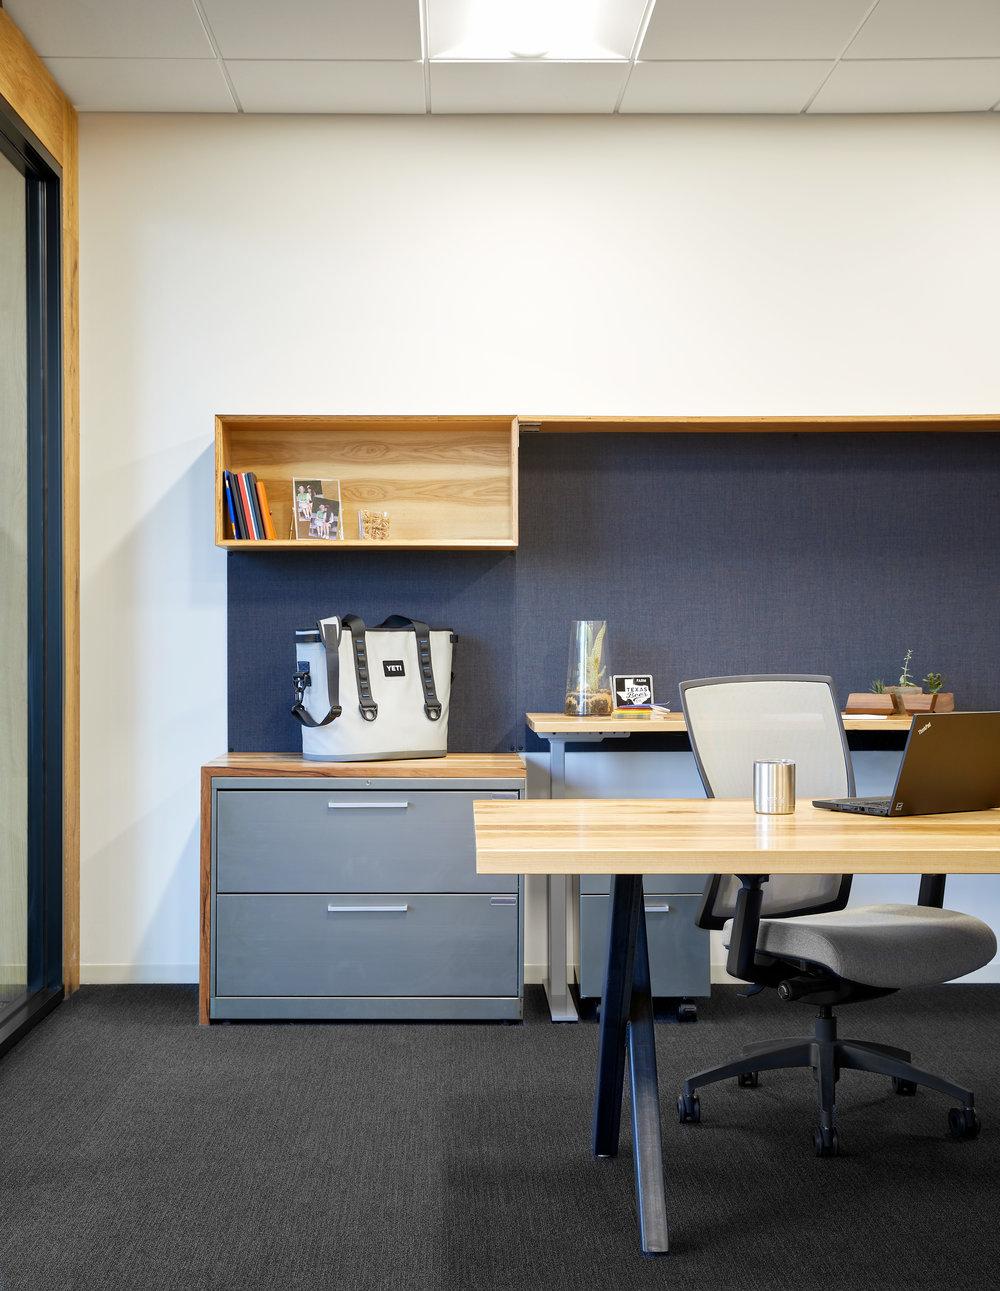 HIPAU_YETI_CEO Office_Baldinger_170714.jpg